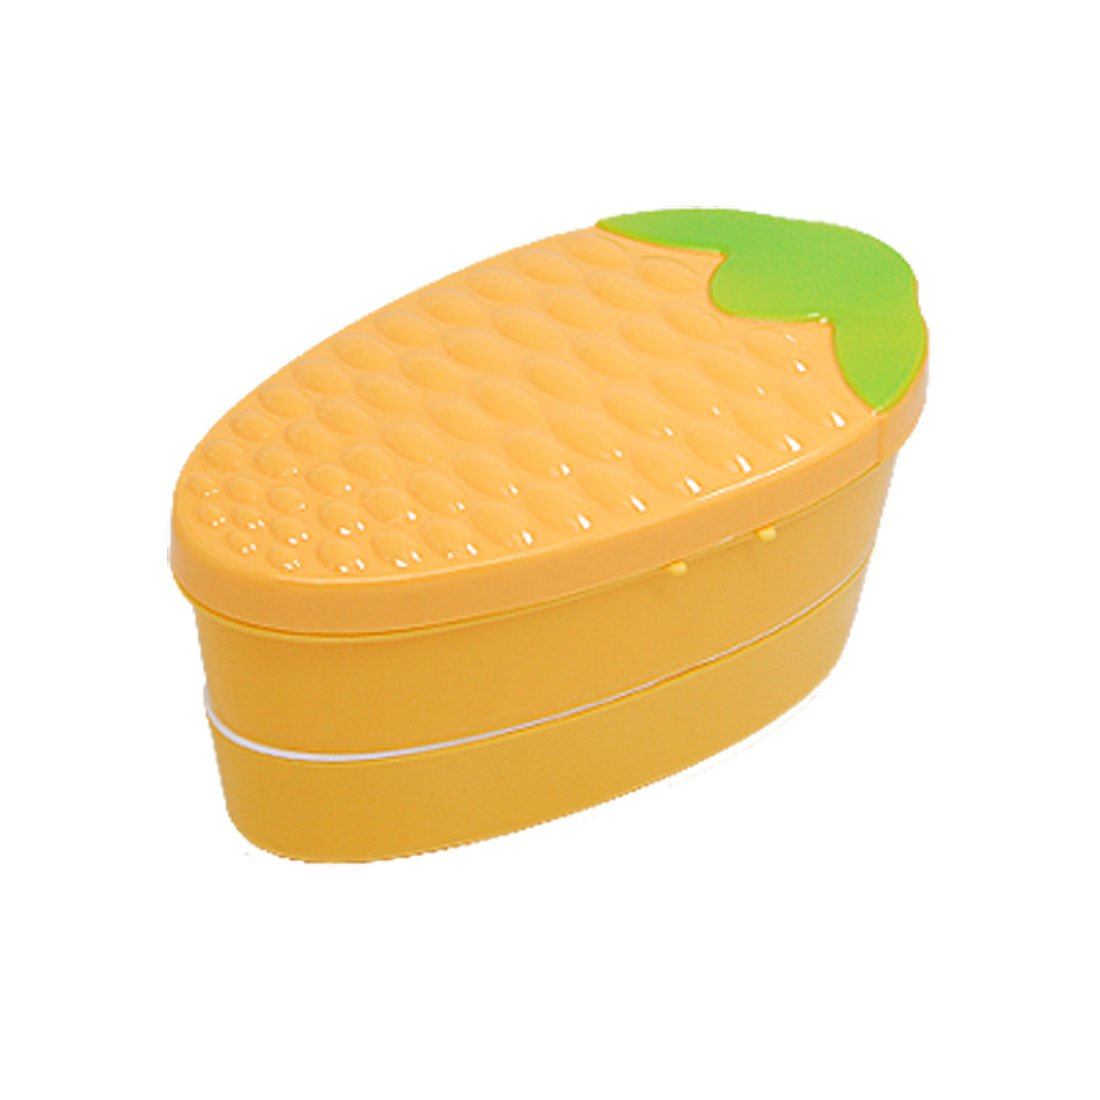 Mealie Corn Shape Double Layer Lunch Pastry Box w Spoon lole капри lsw1349 lively capris xl blue corn